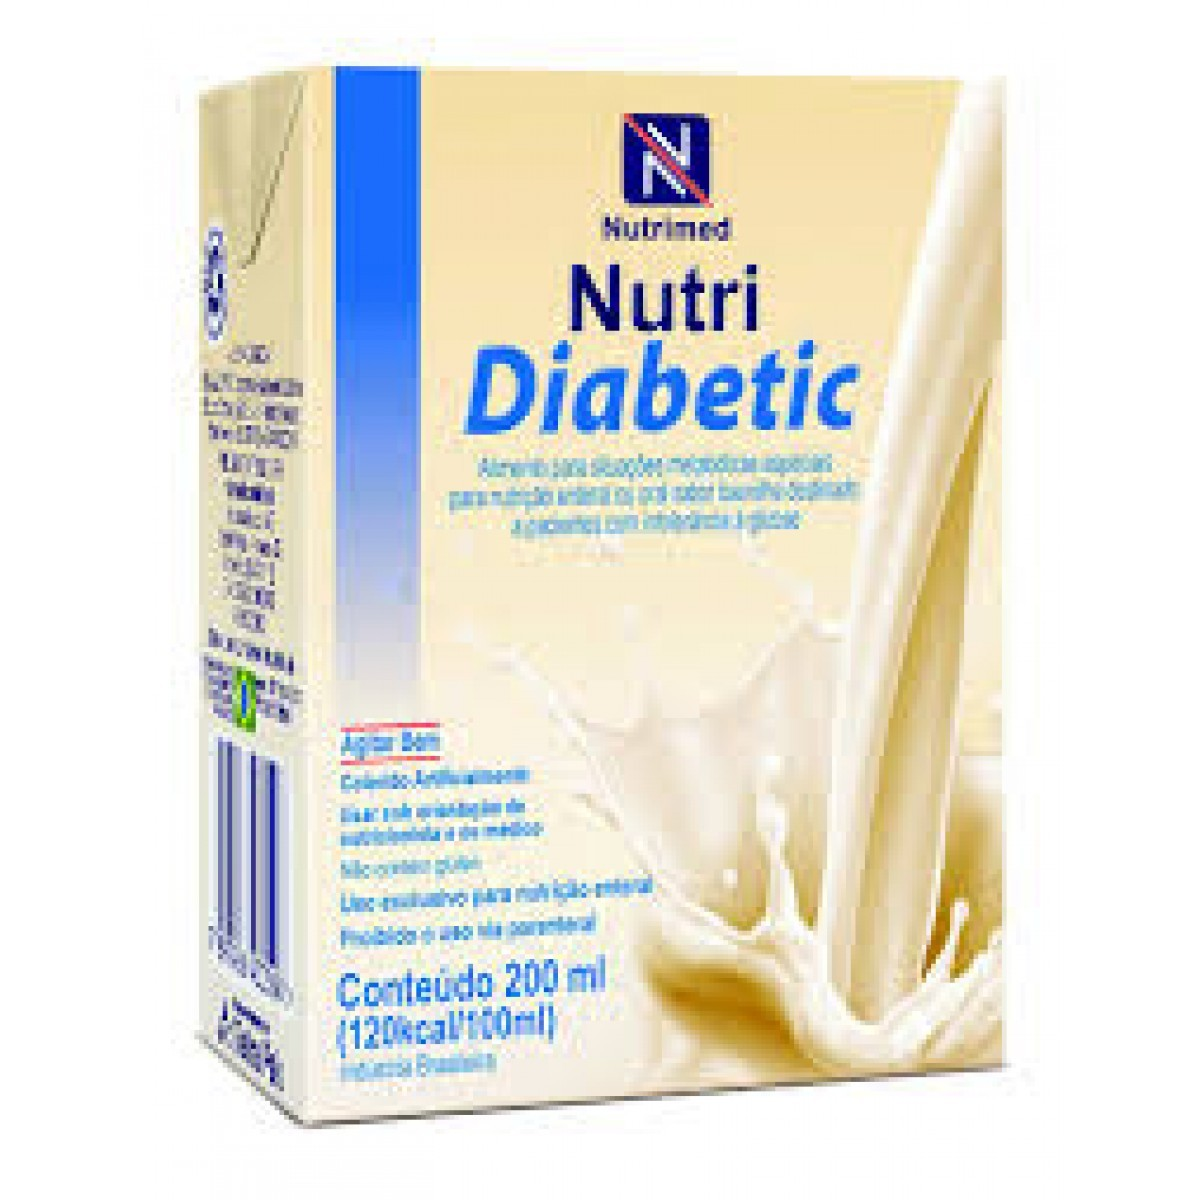 Nutri Diabetic Baunilha - 200 mL - (DANONE)